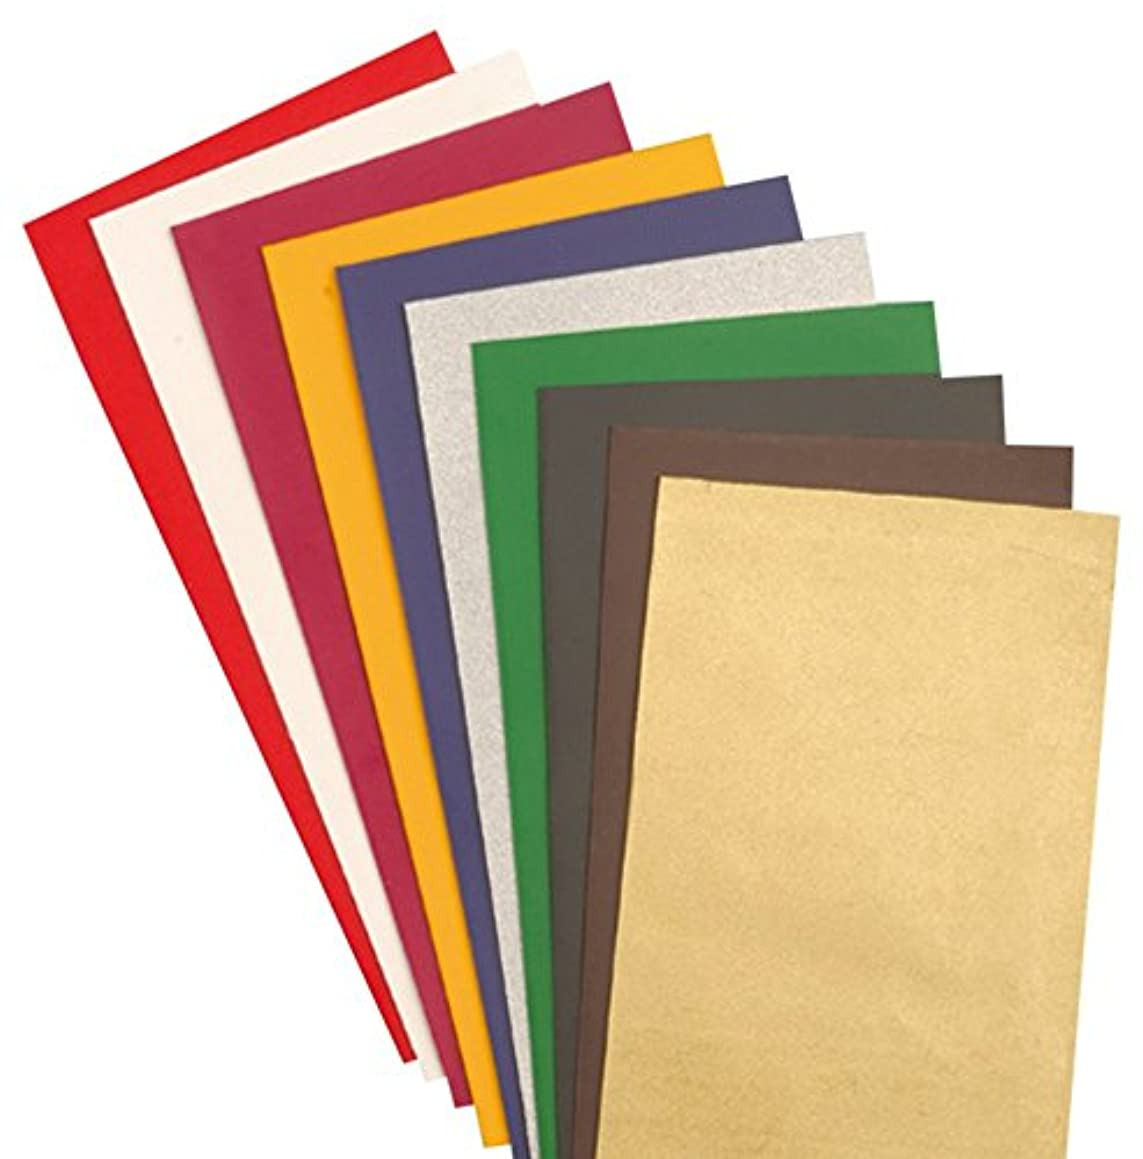 EFCO Wax Sheet, Multi-Colour, 100 x 100 x 0.5 mm, 10-Piece by Efco